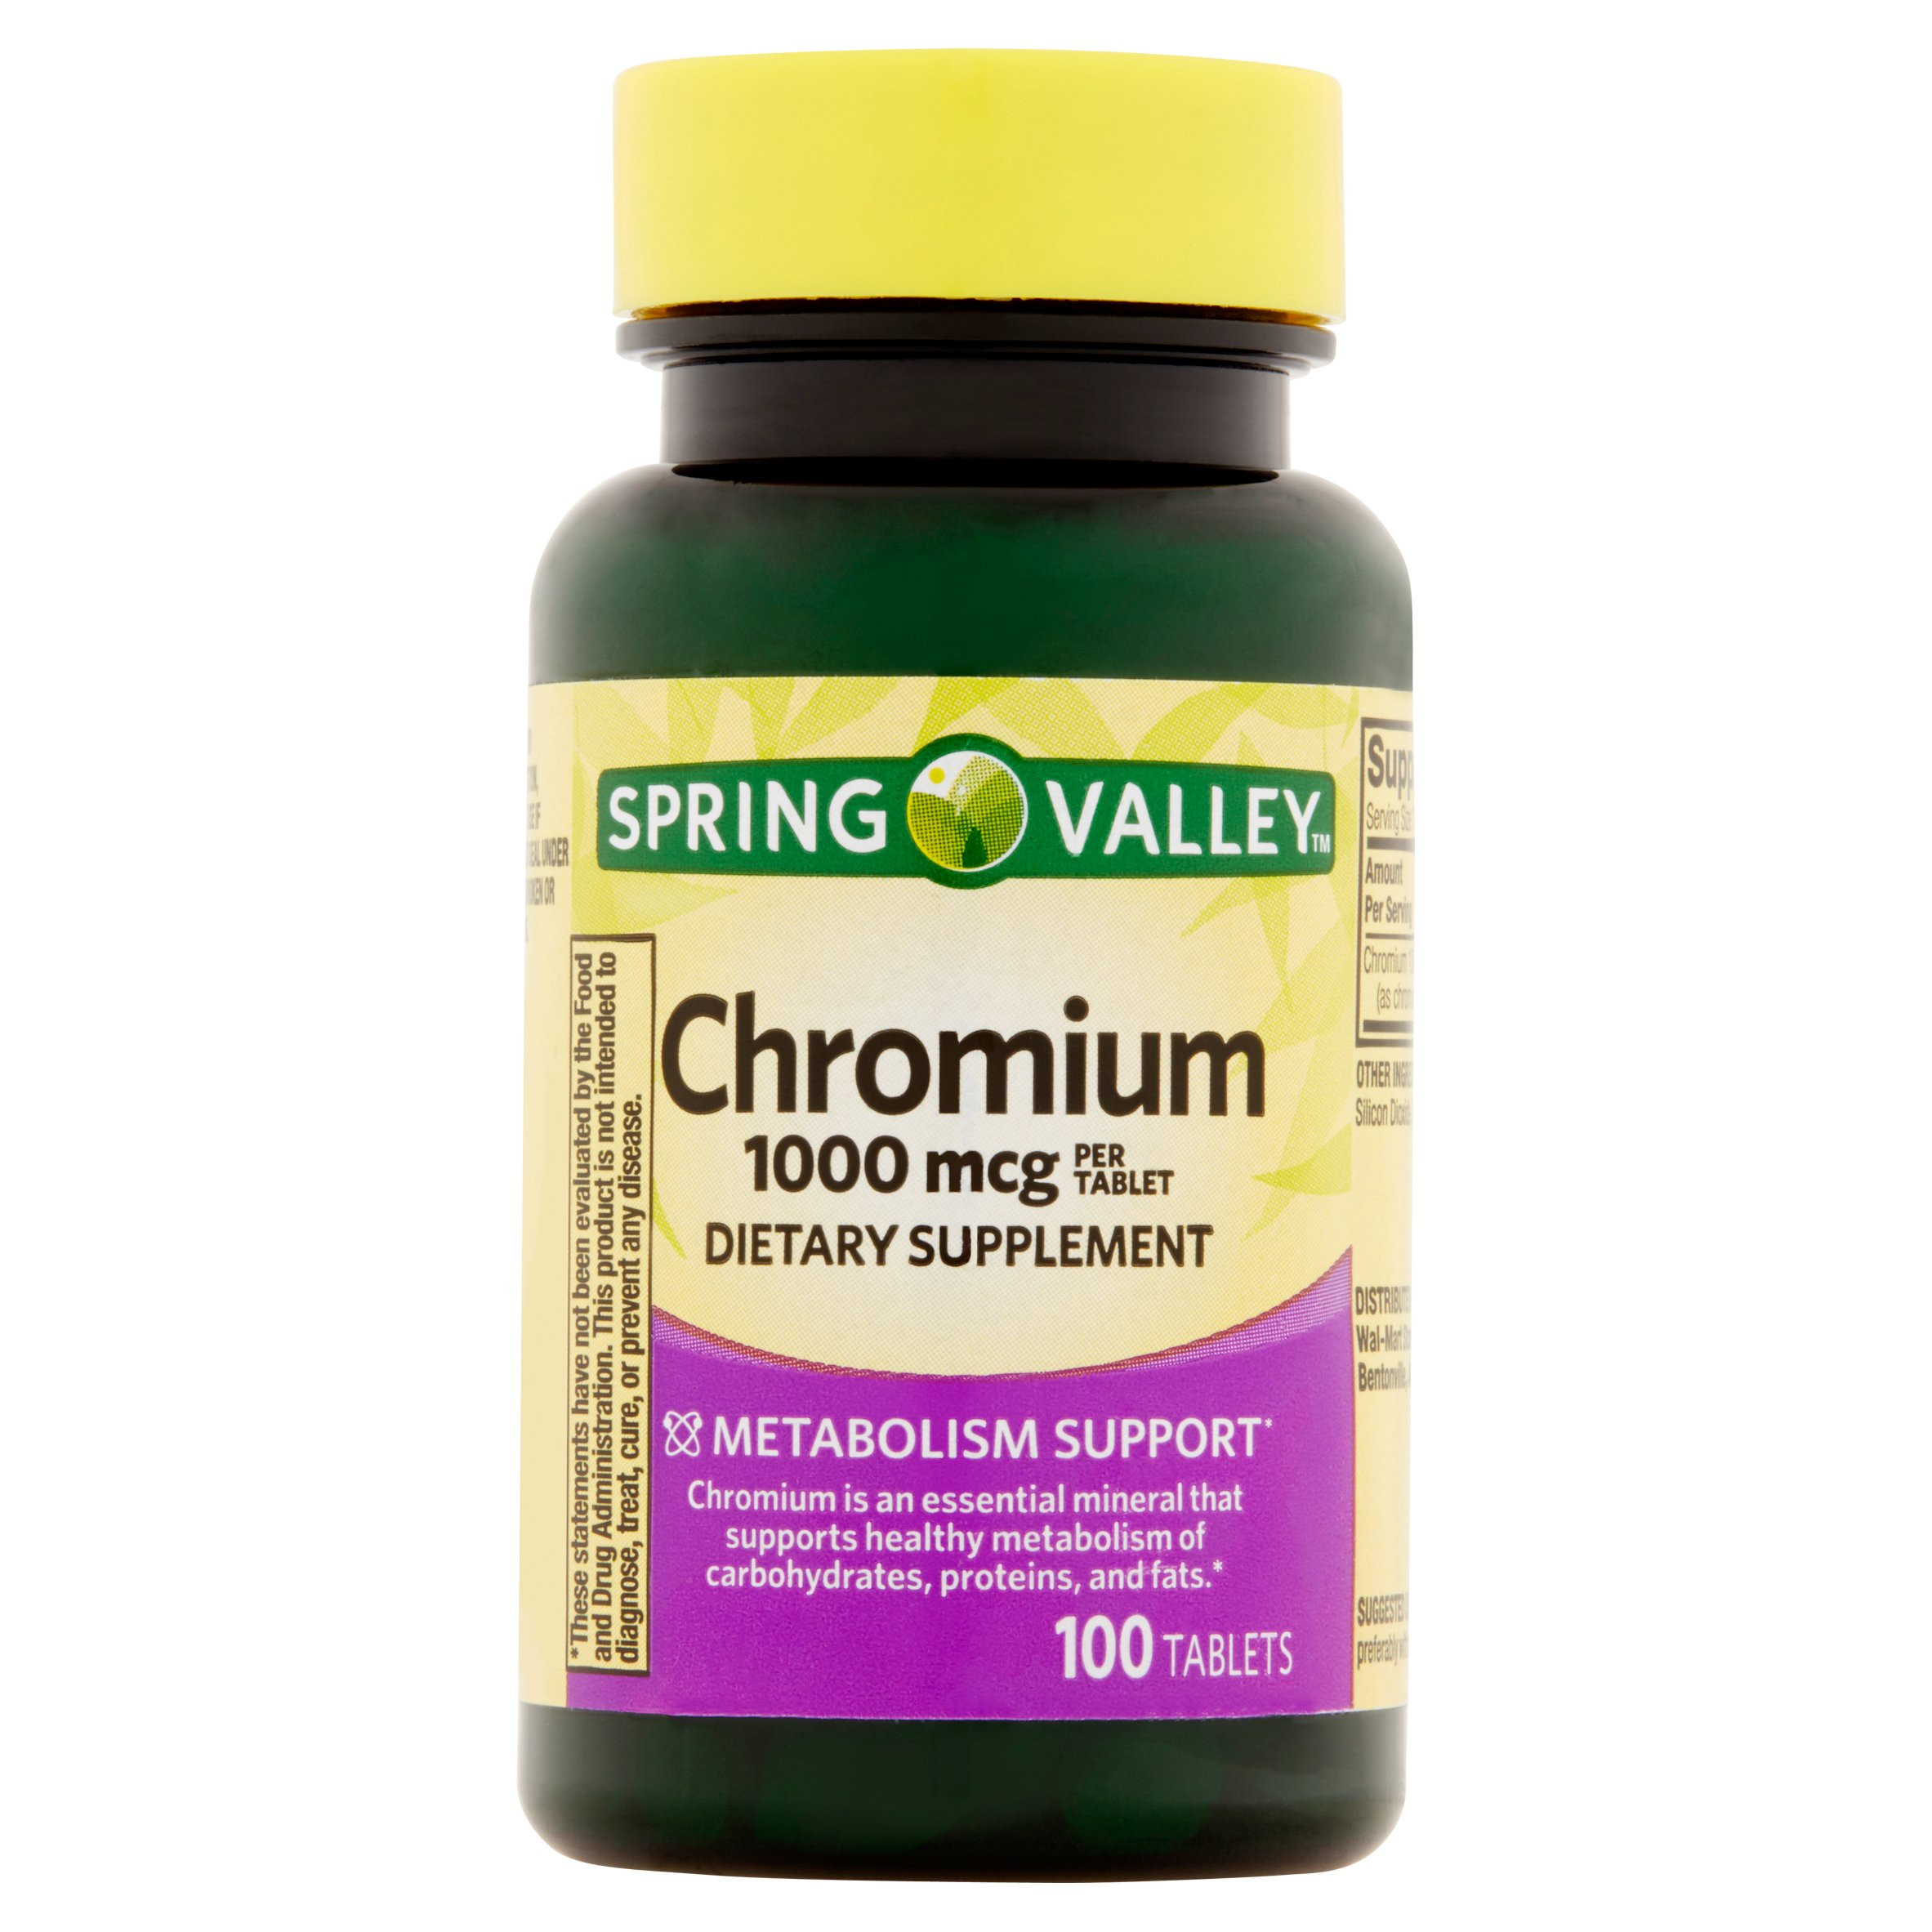 Spring Valley Chromium Tablets, 1000 mcg, 100 Ct